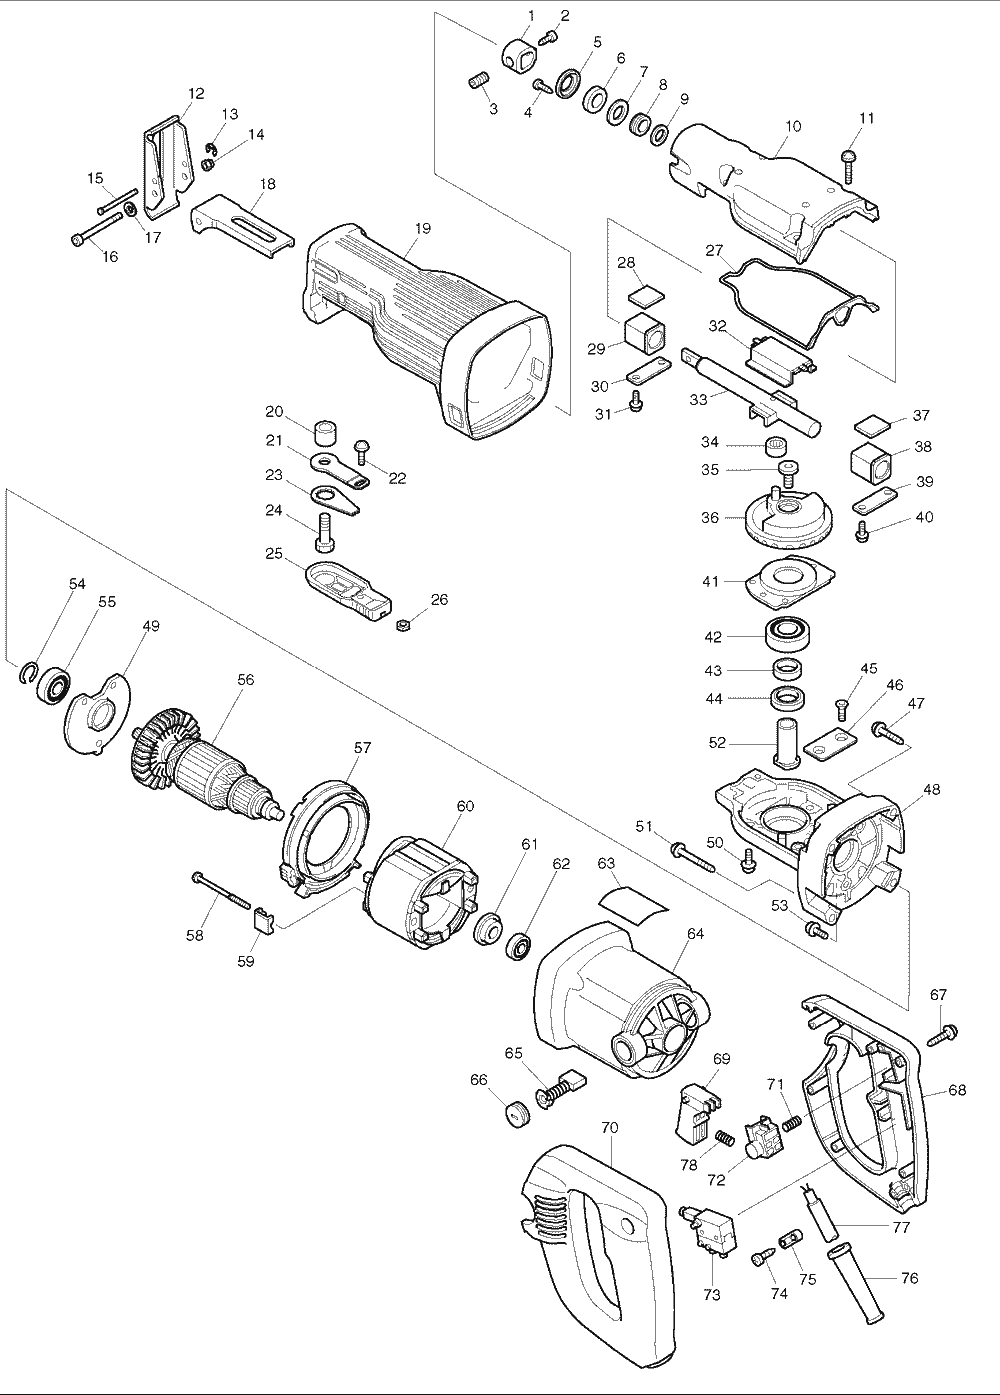 Buy Makita Jr3030 Reciprocating Replacement Tool Parts